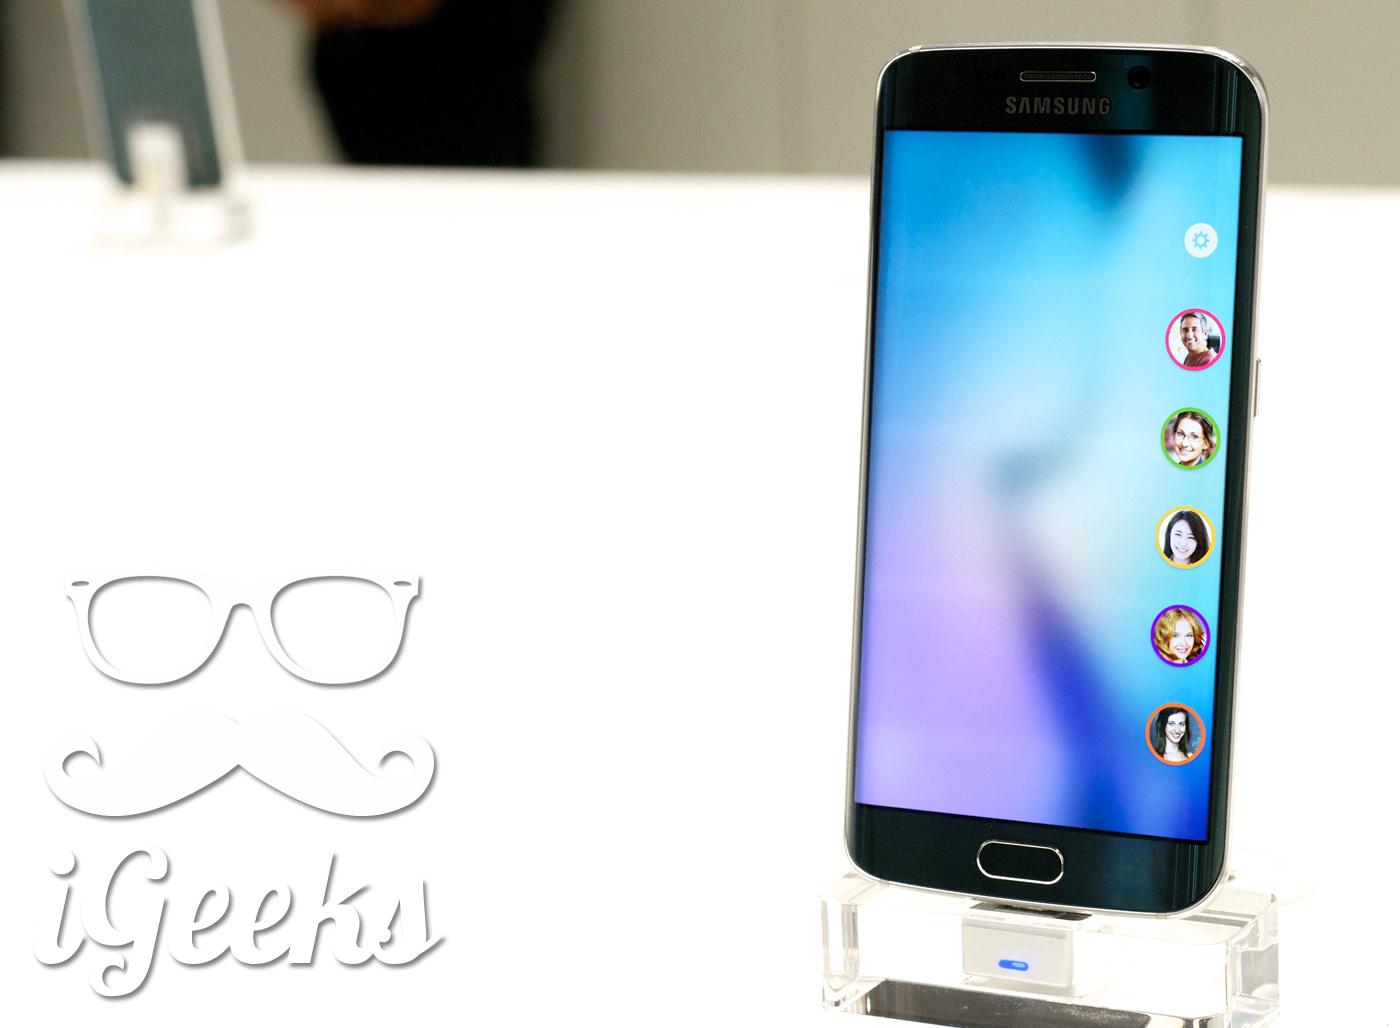 iGeeks-Samsung-S6-MWC2015-33